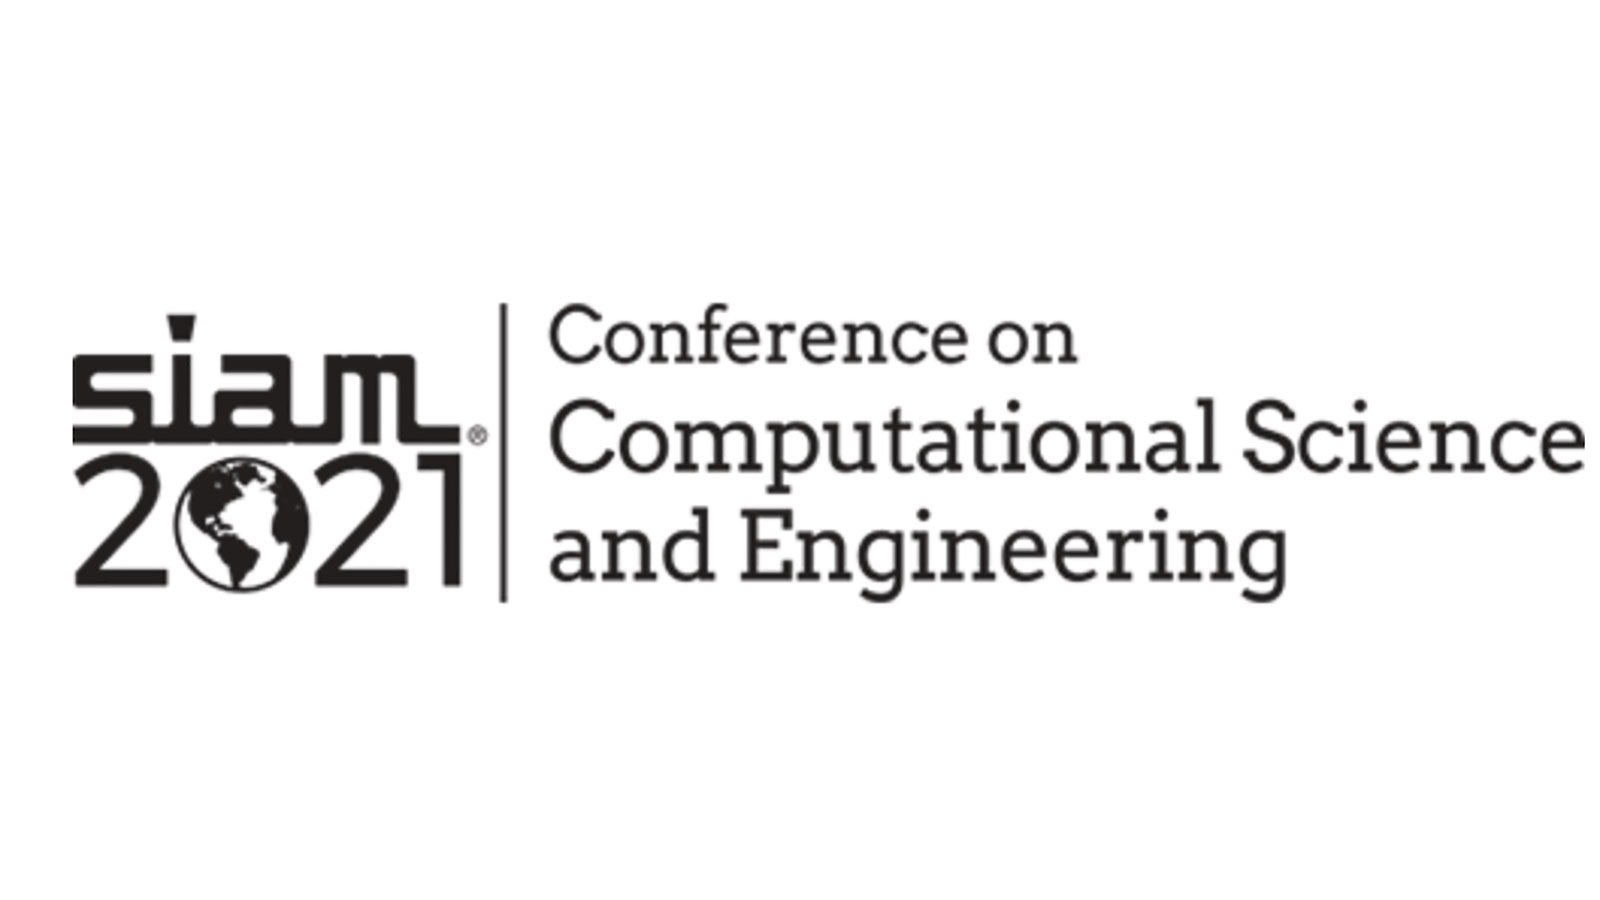 SIAM Conference Logo